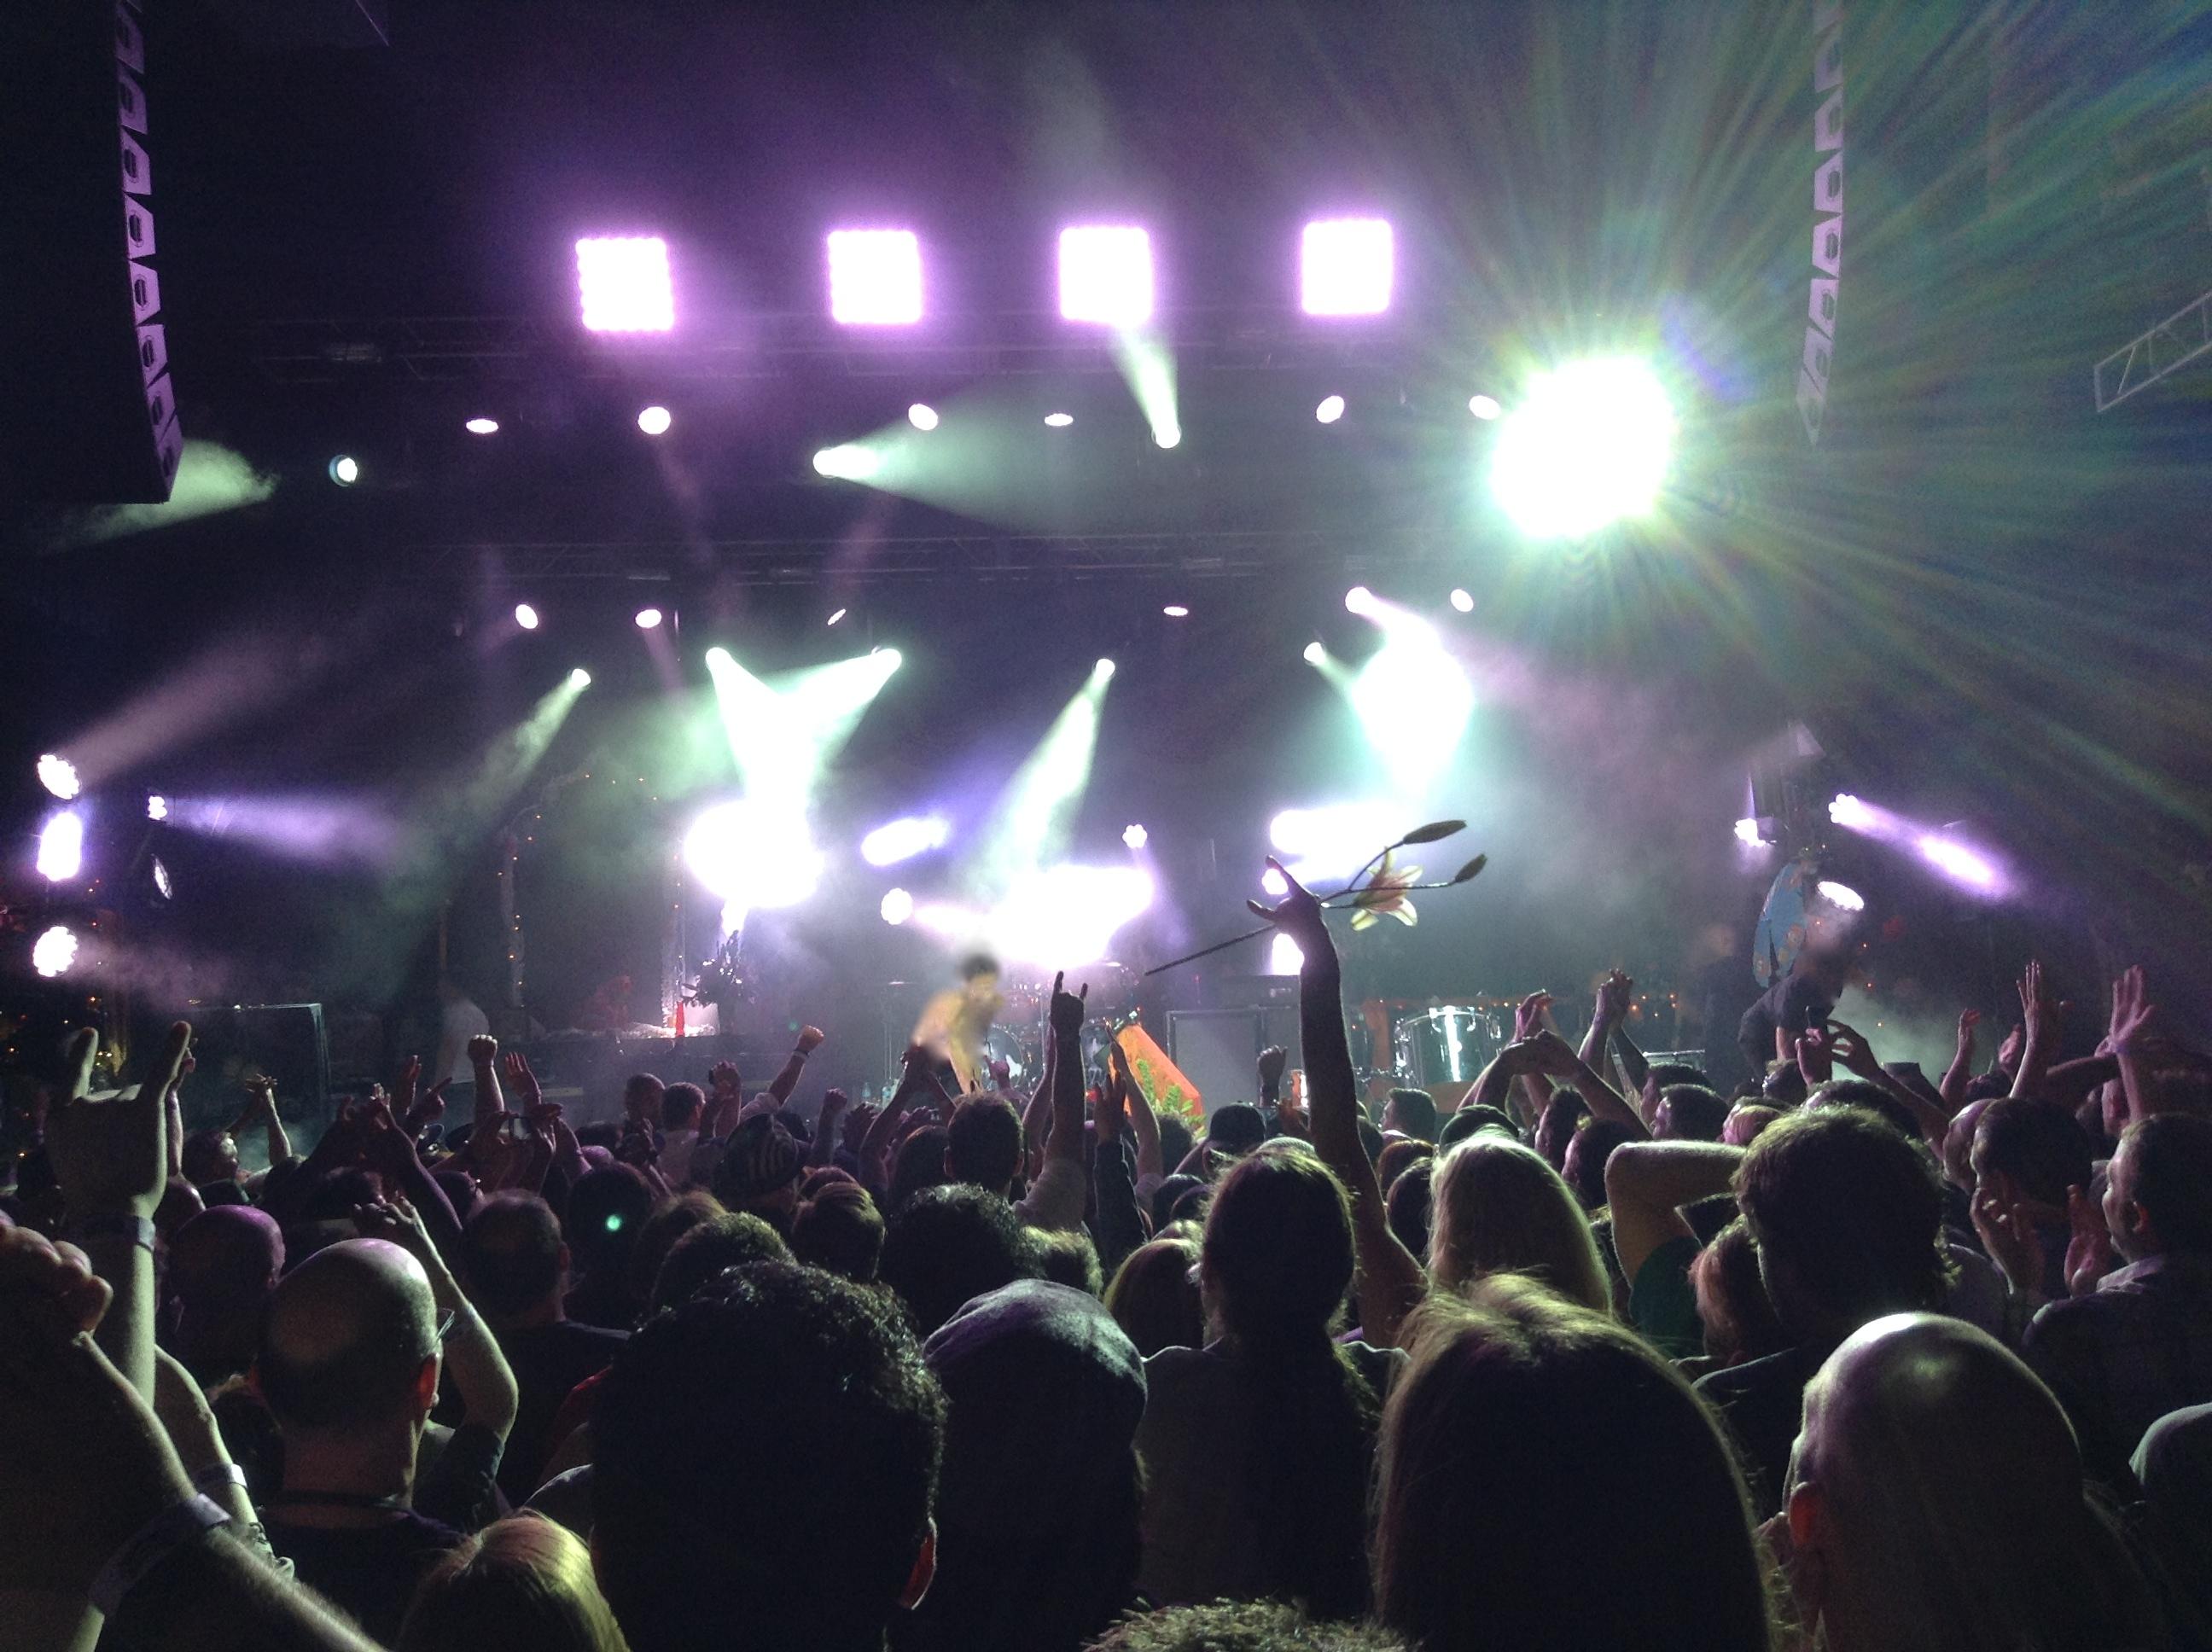 800px-Manchester_Arena_concert,_November_2012